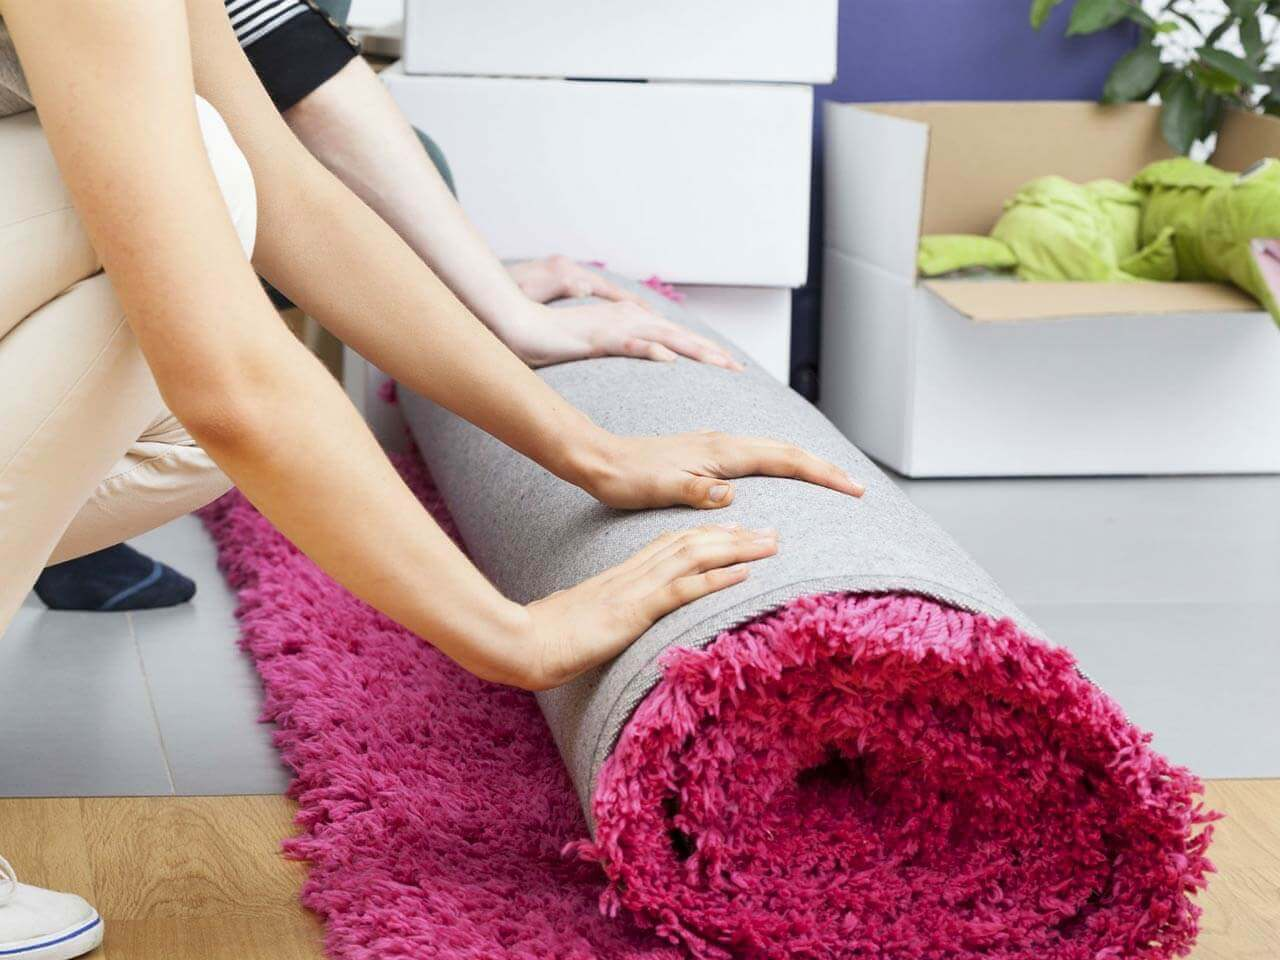 Couple unrolling carpet